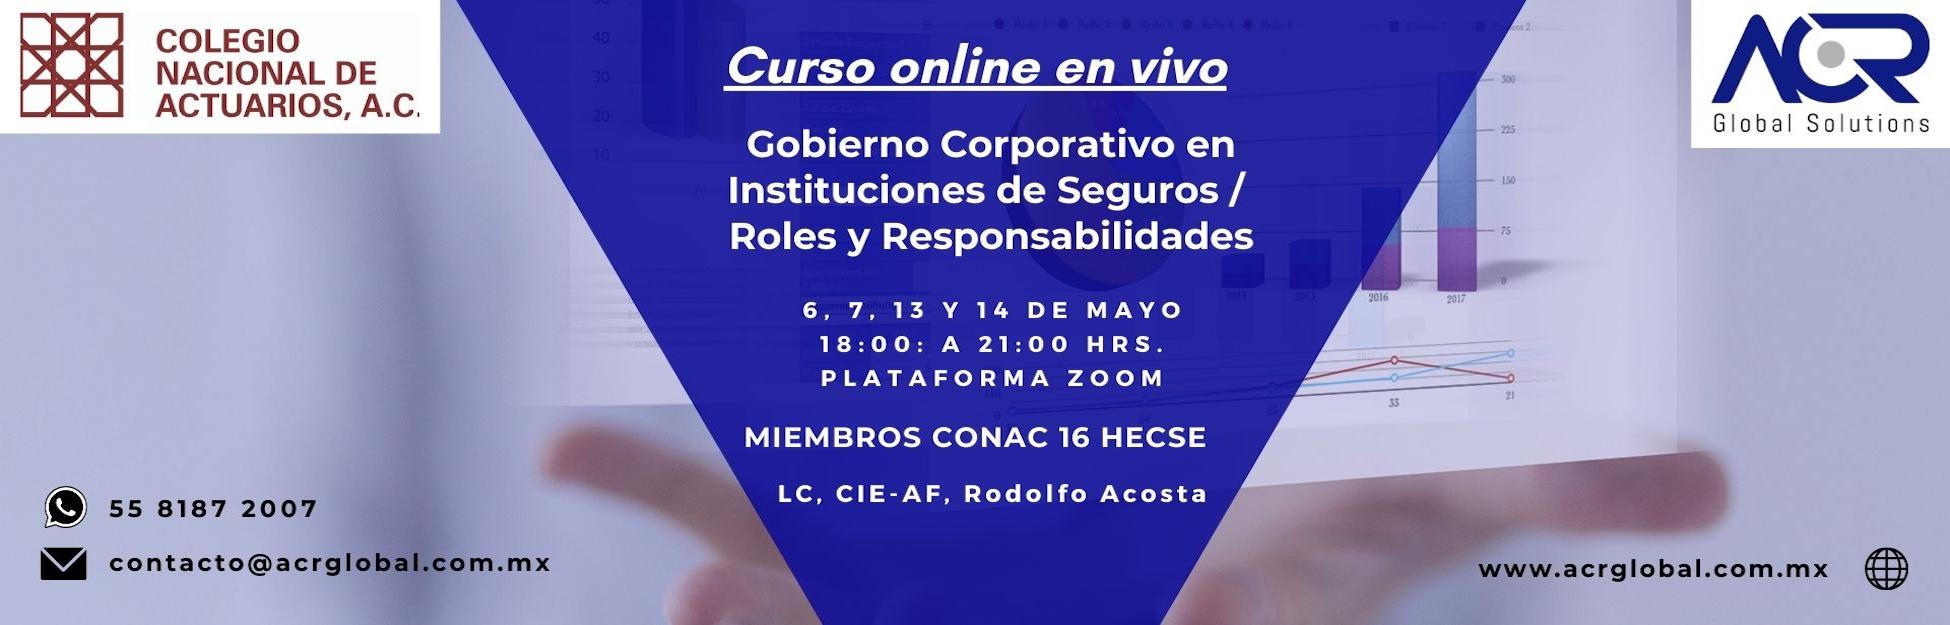 GCIS_WEB2